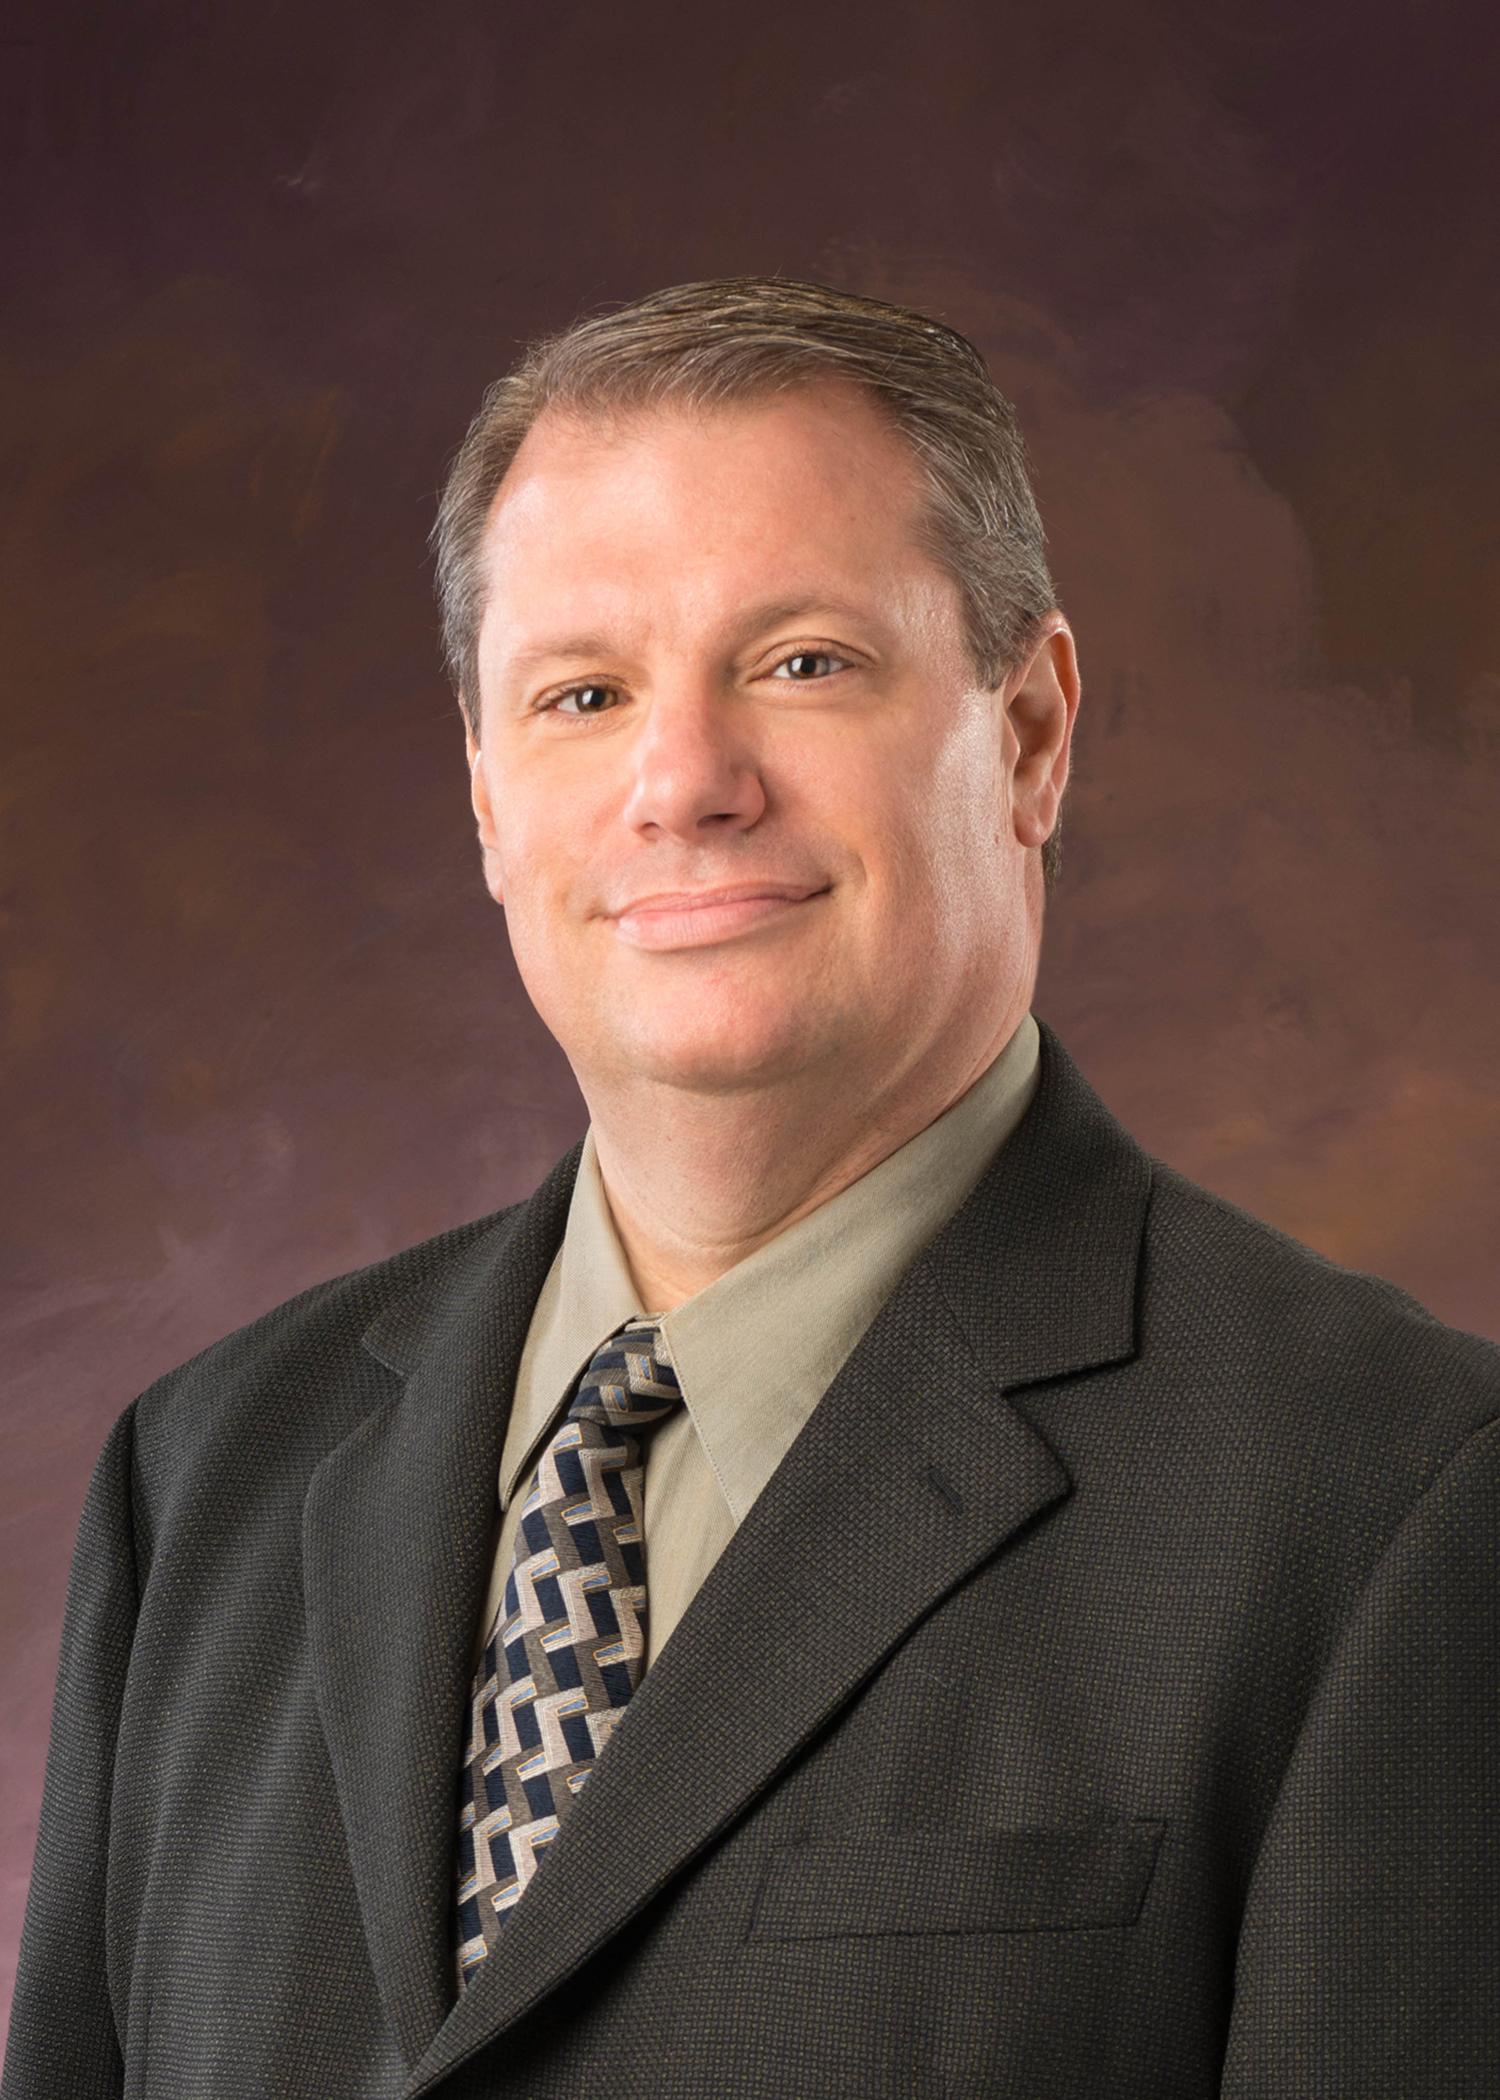 Paul Cwik